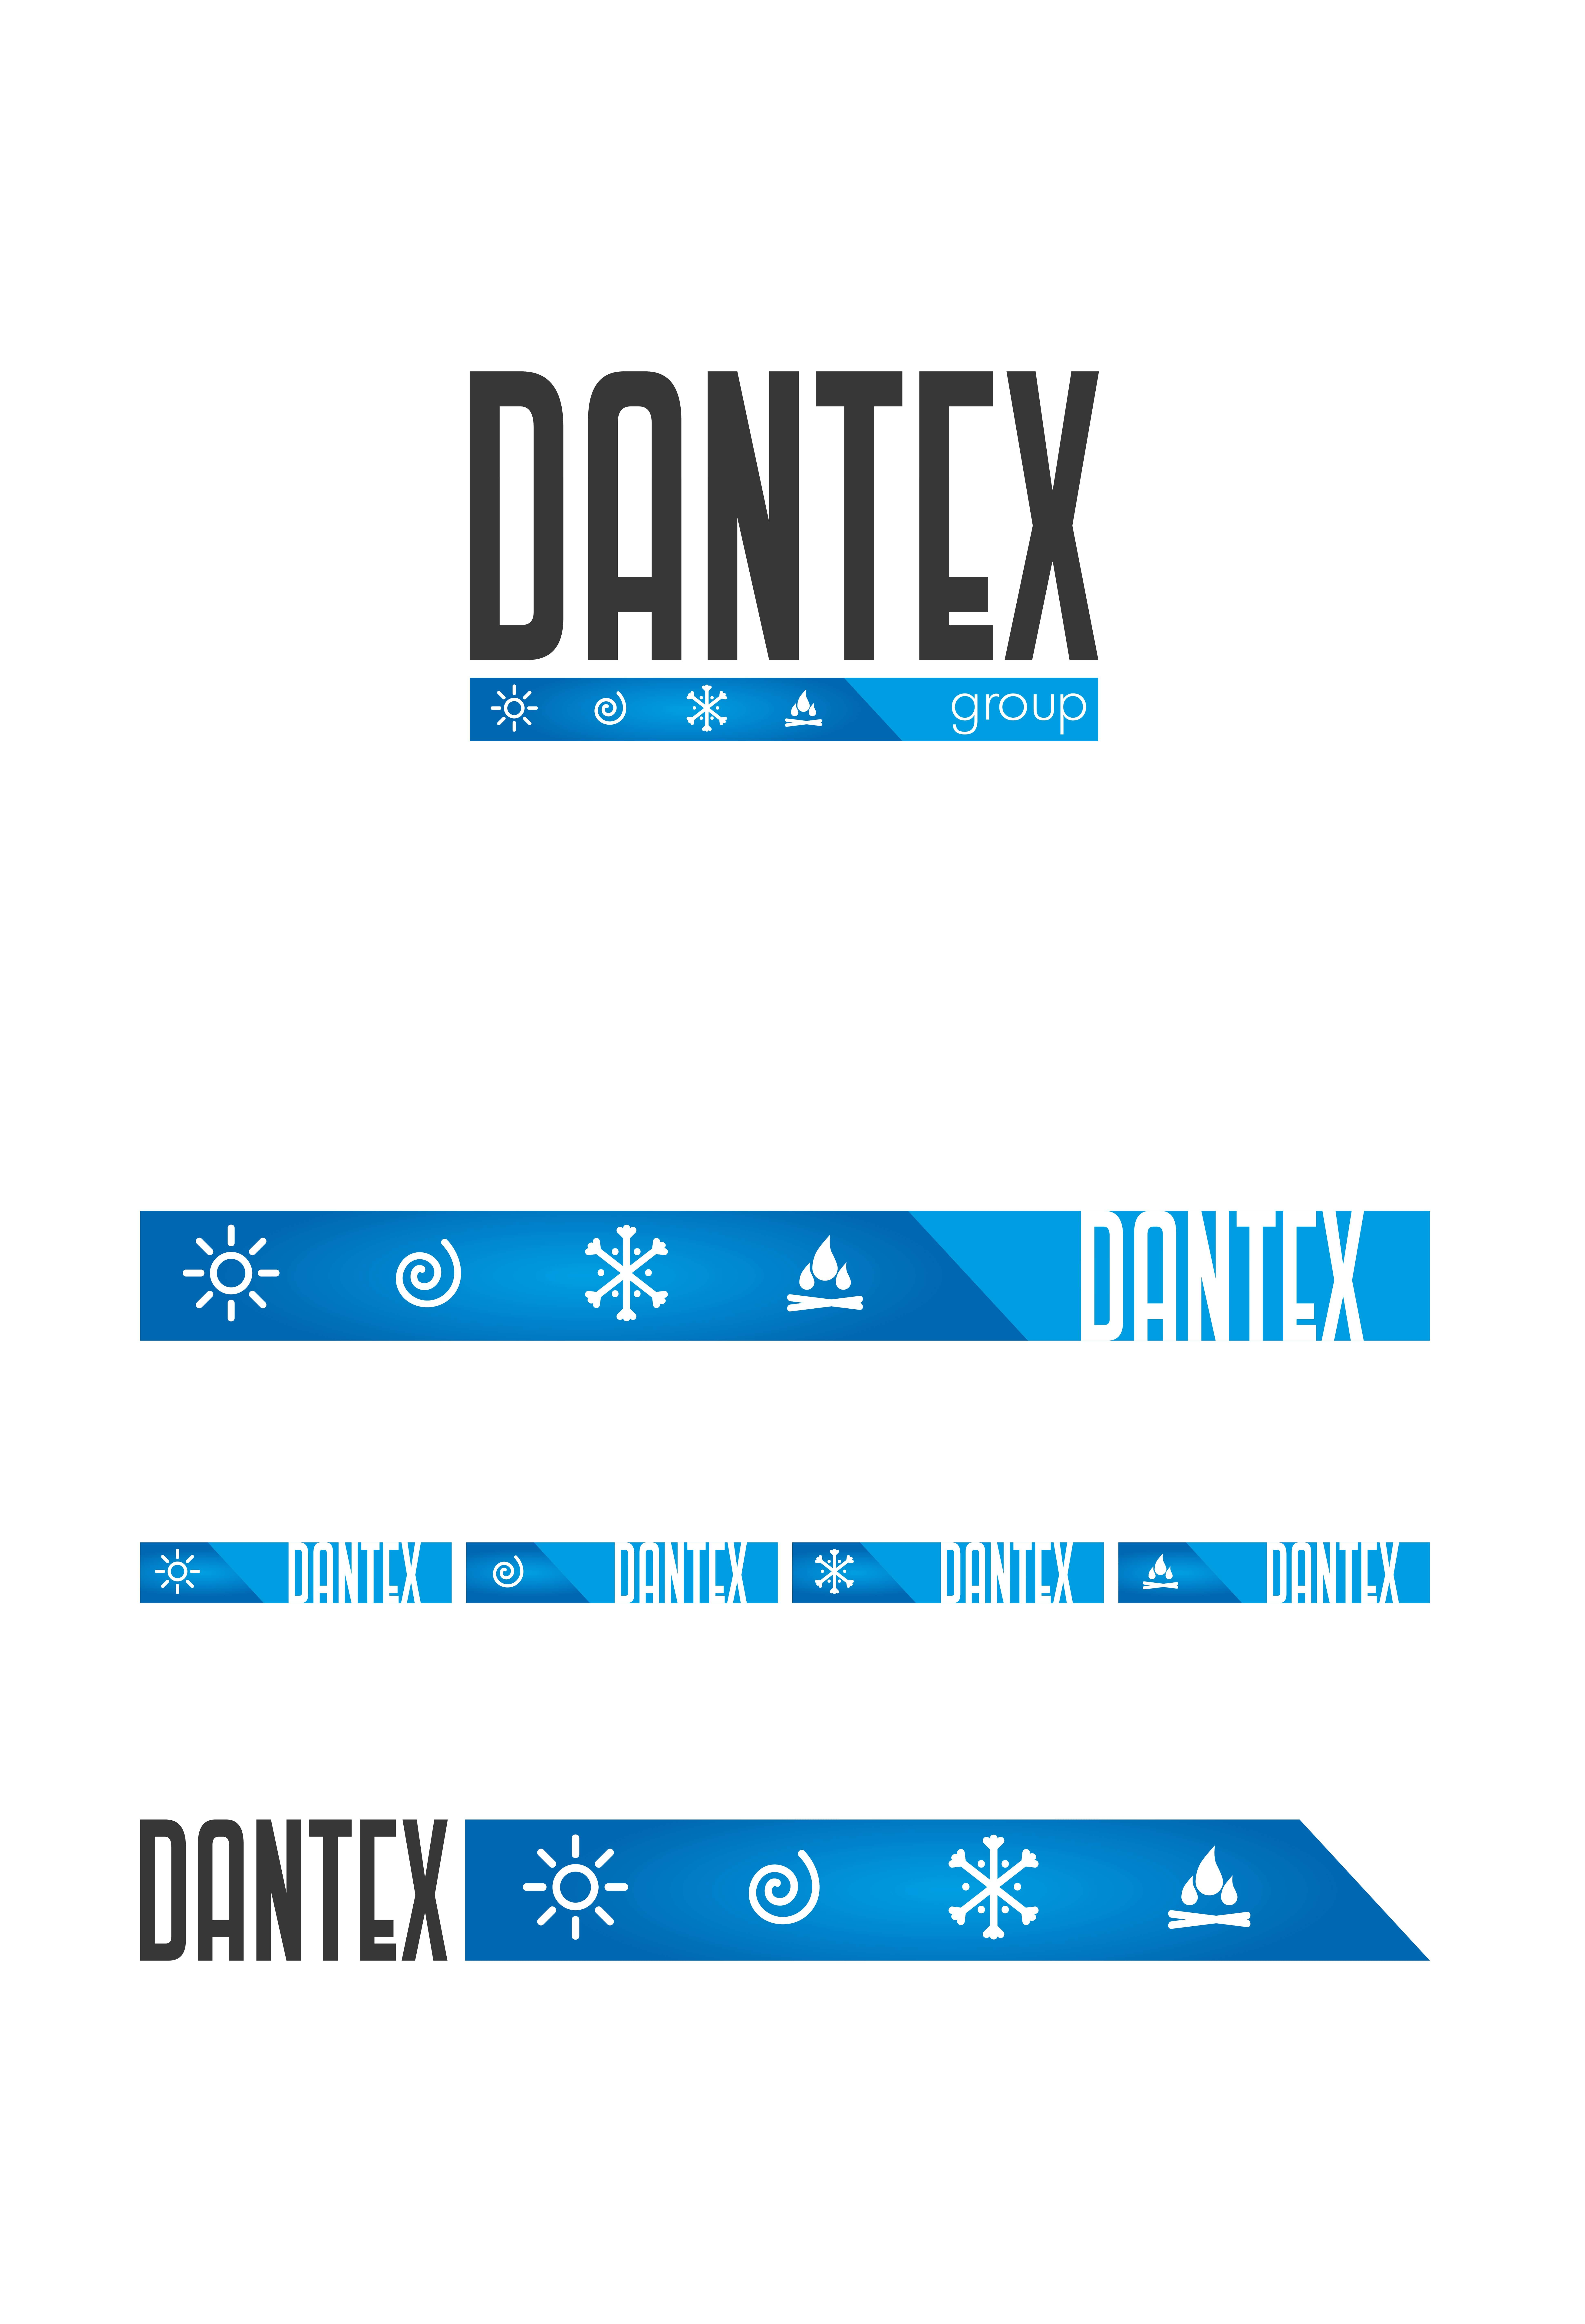 Конкурс на разработку логотипа для компании Dantex Group  фото f_5185c01007be5e53.jpg